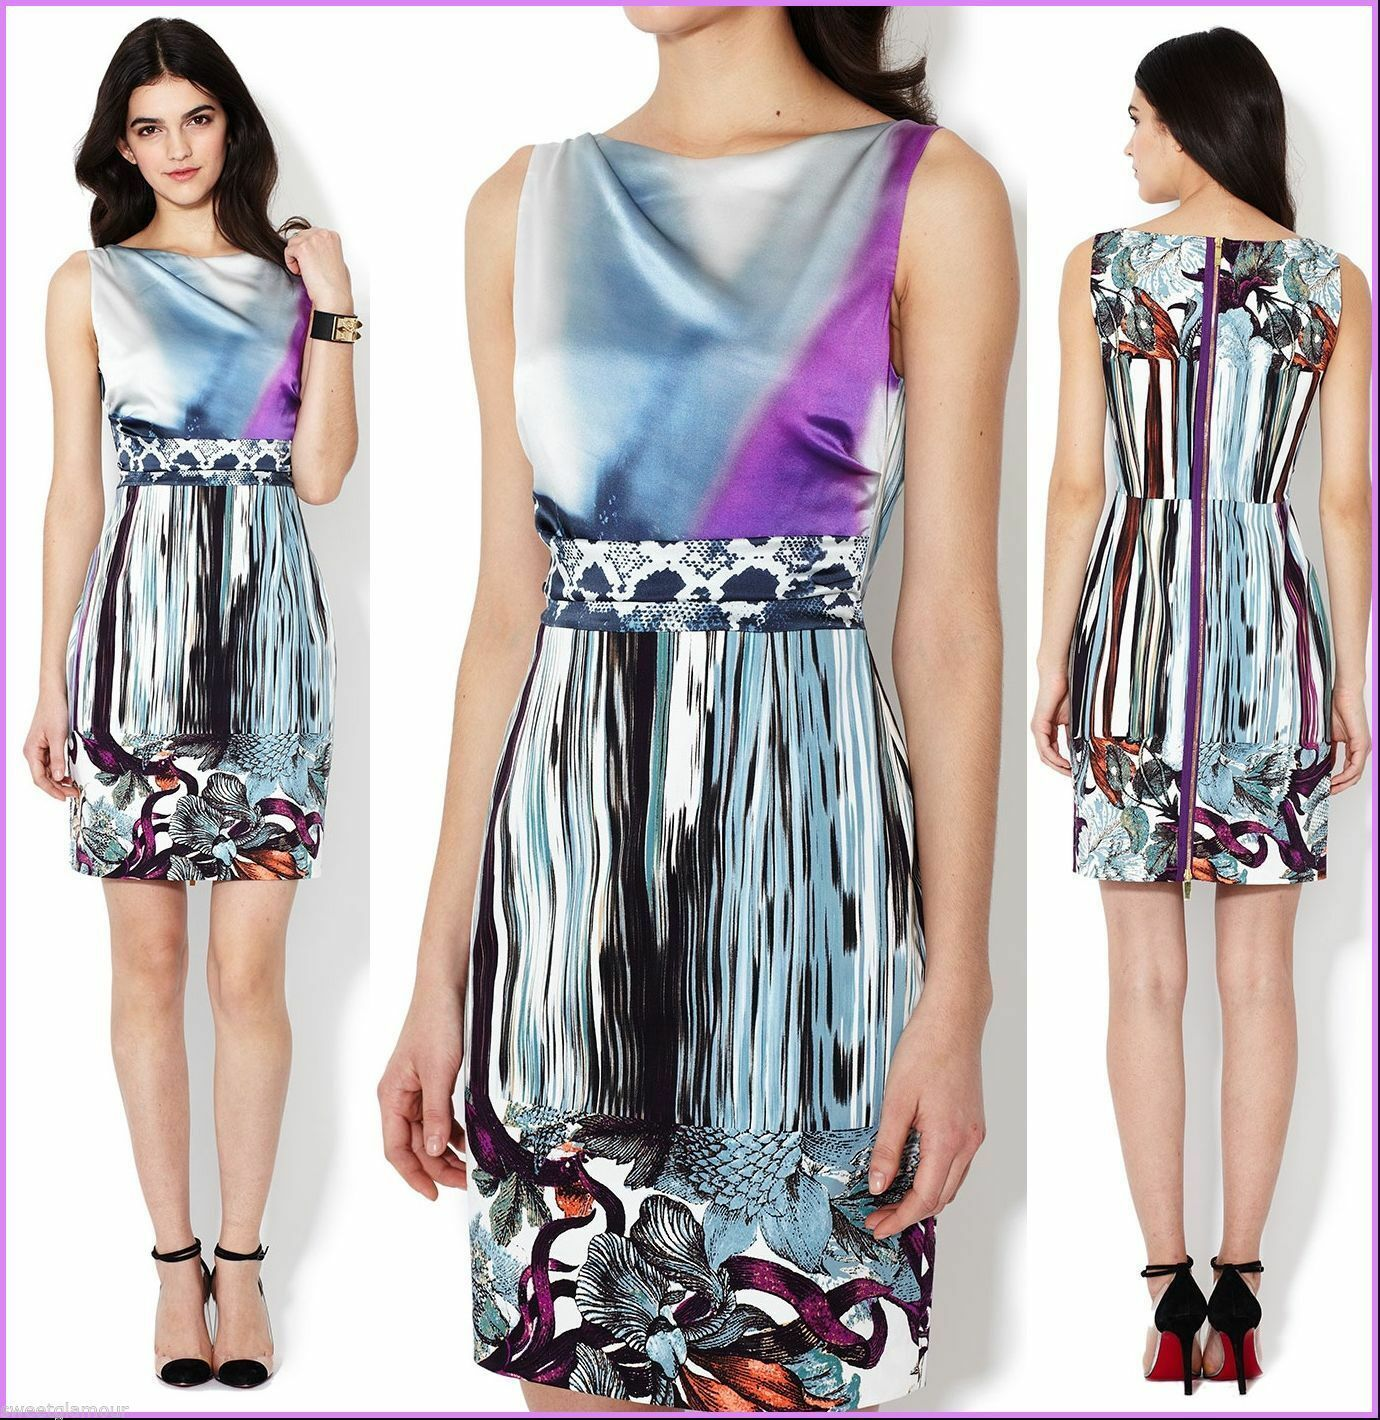 Elie Tahari Avery Cyan Spa Print Stretch Cotton Silk Shift Dress 10